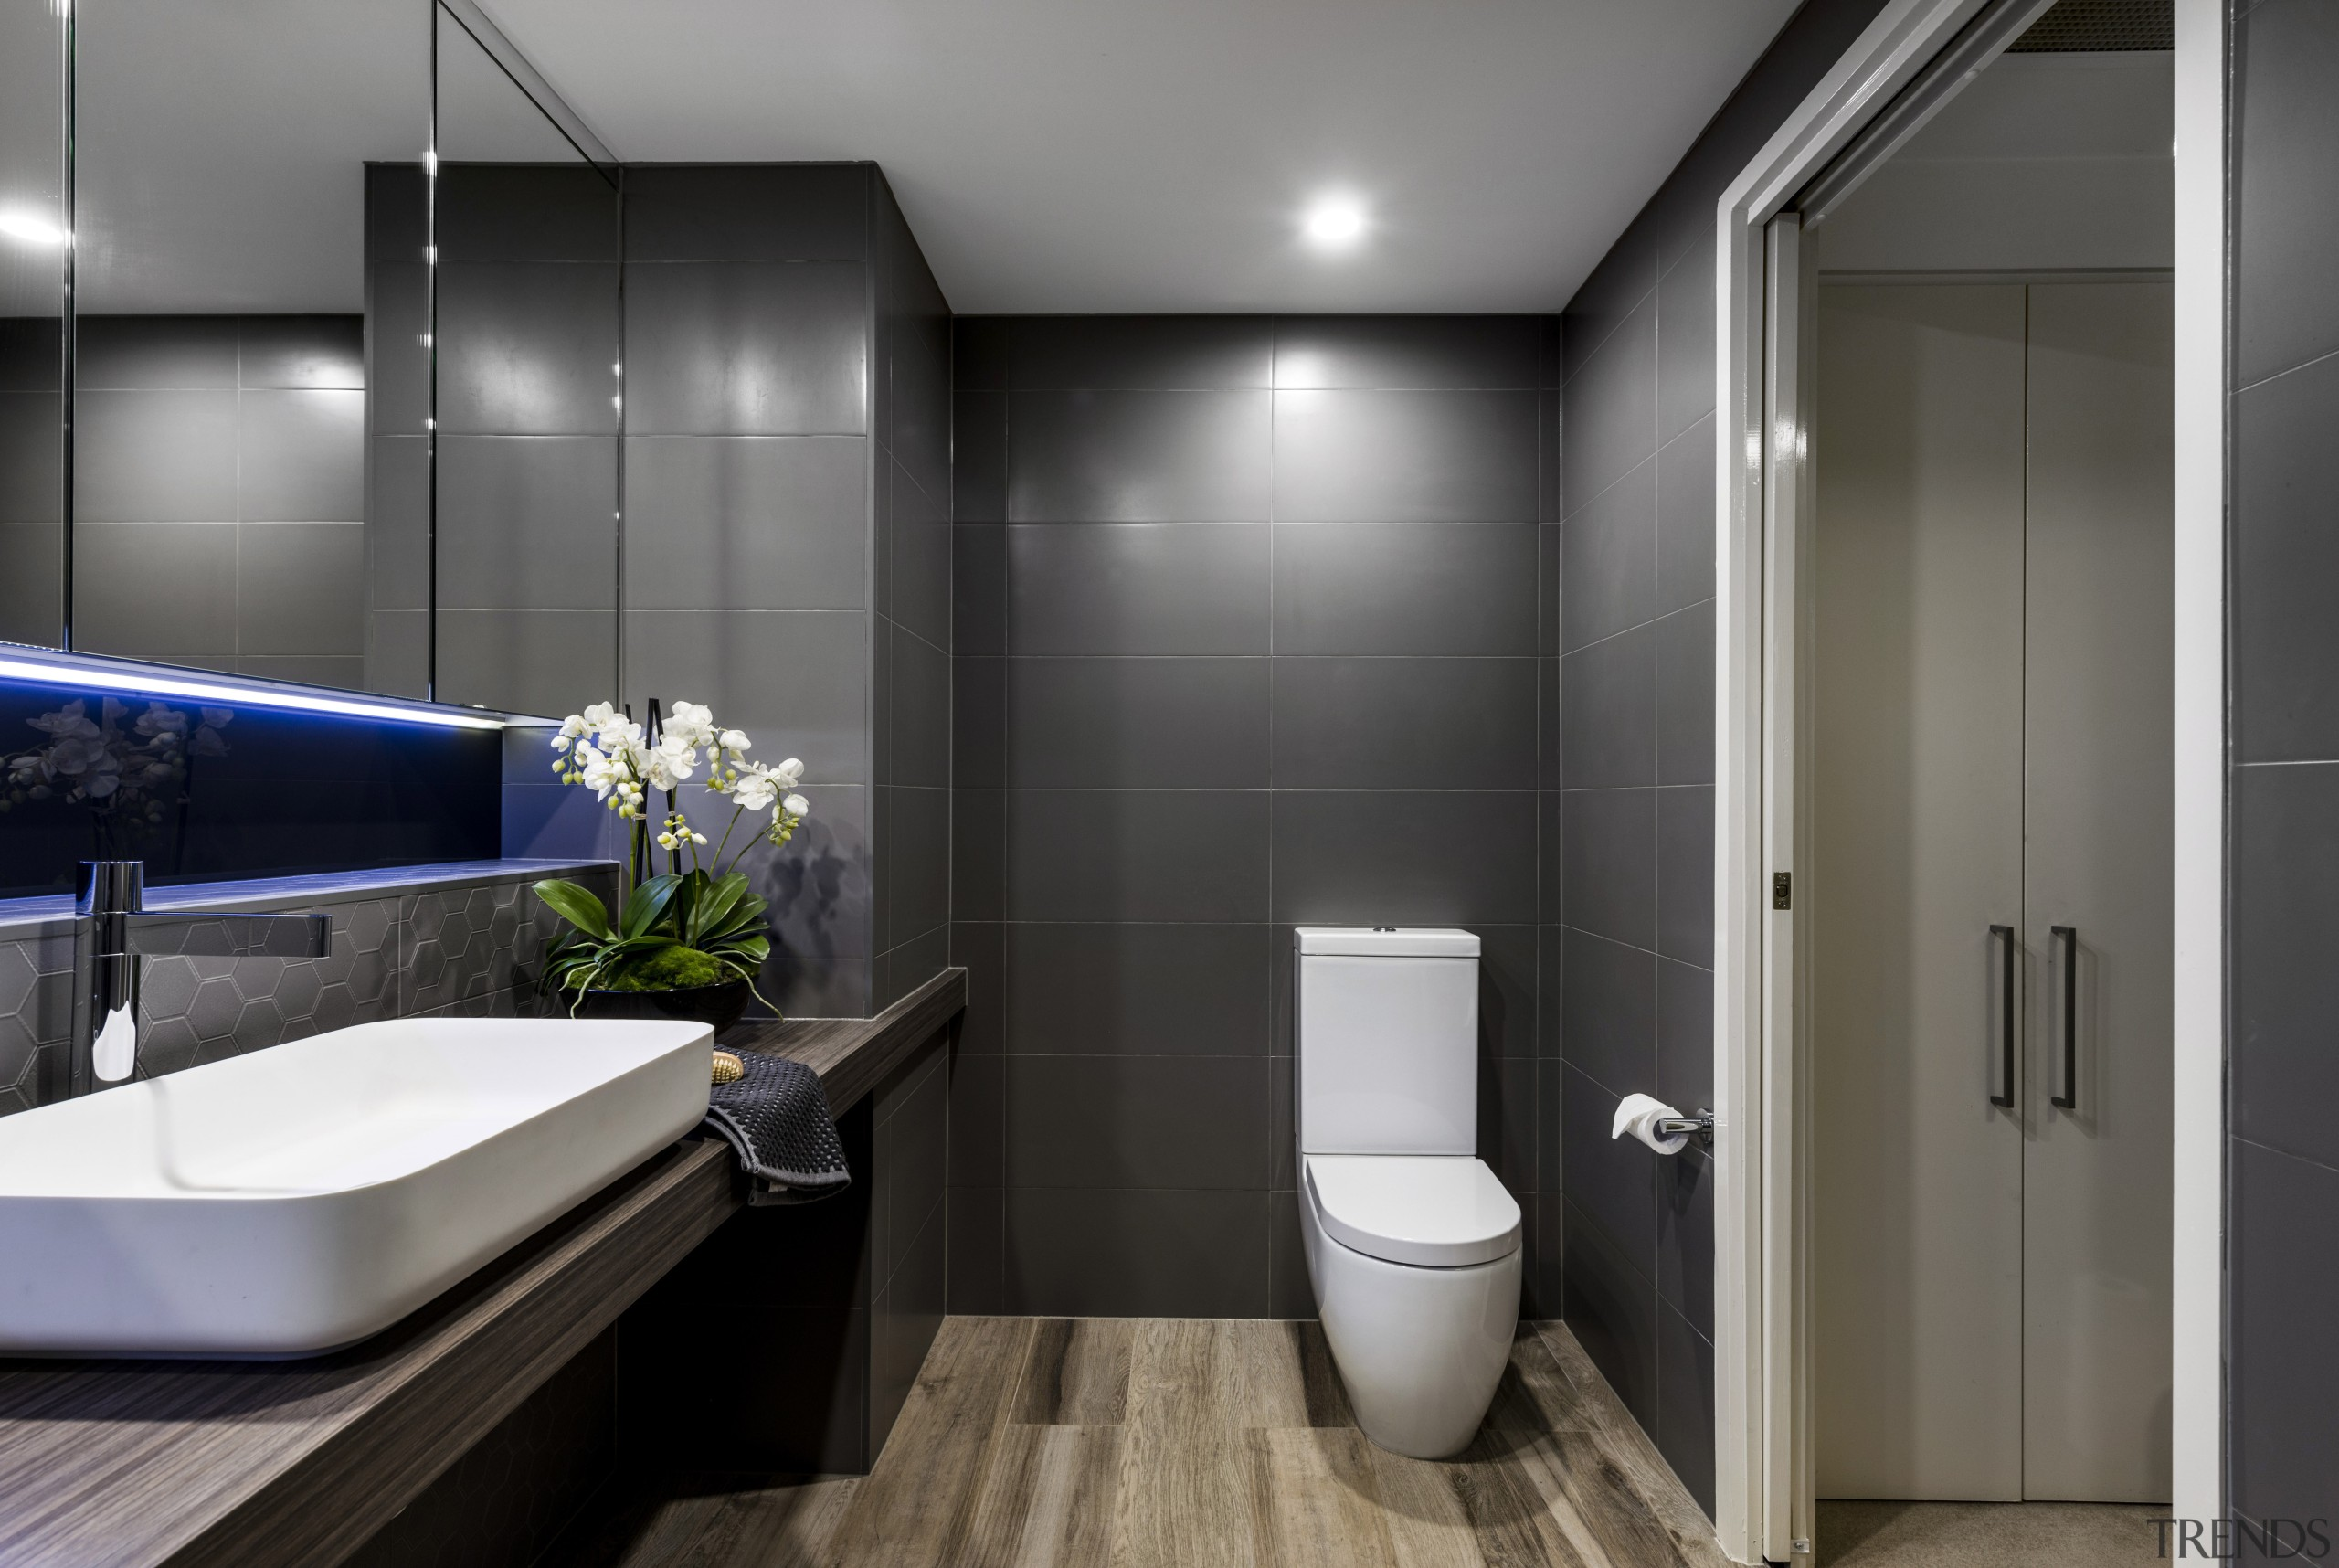 Contrasting a grey-black palette, a veneer vanity top bathroom, interior design, plumbing fixture, product design, public toilet, room, toilet, gray, black